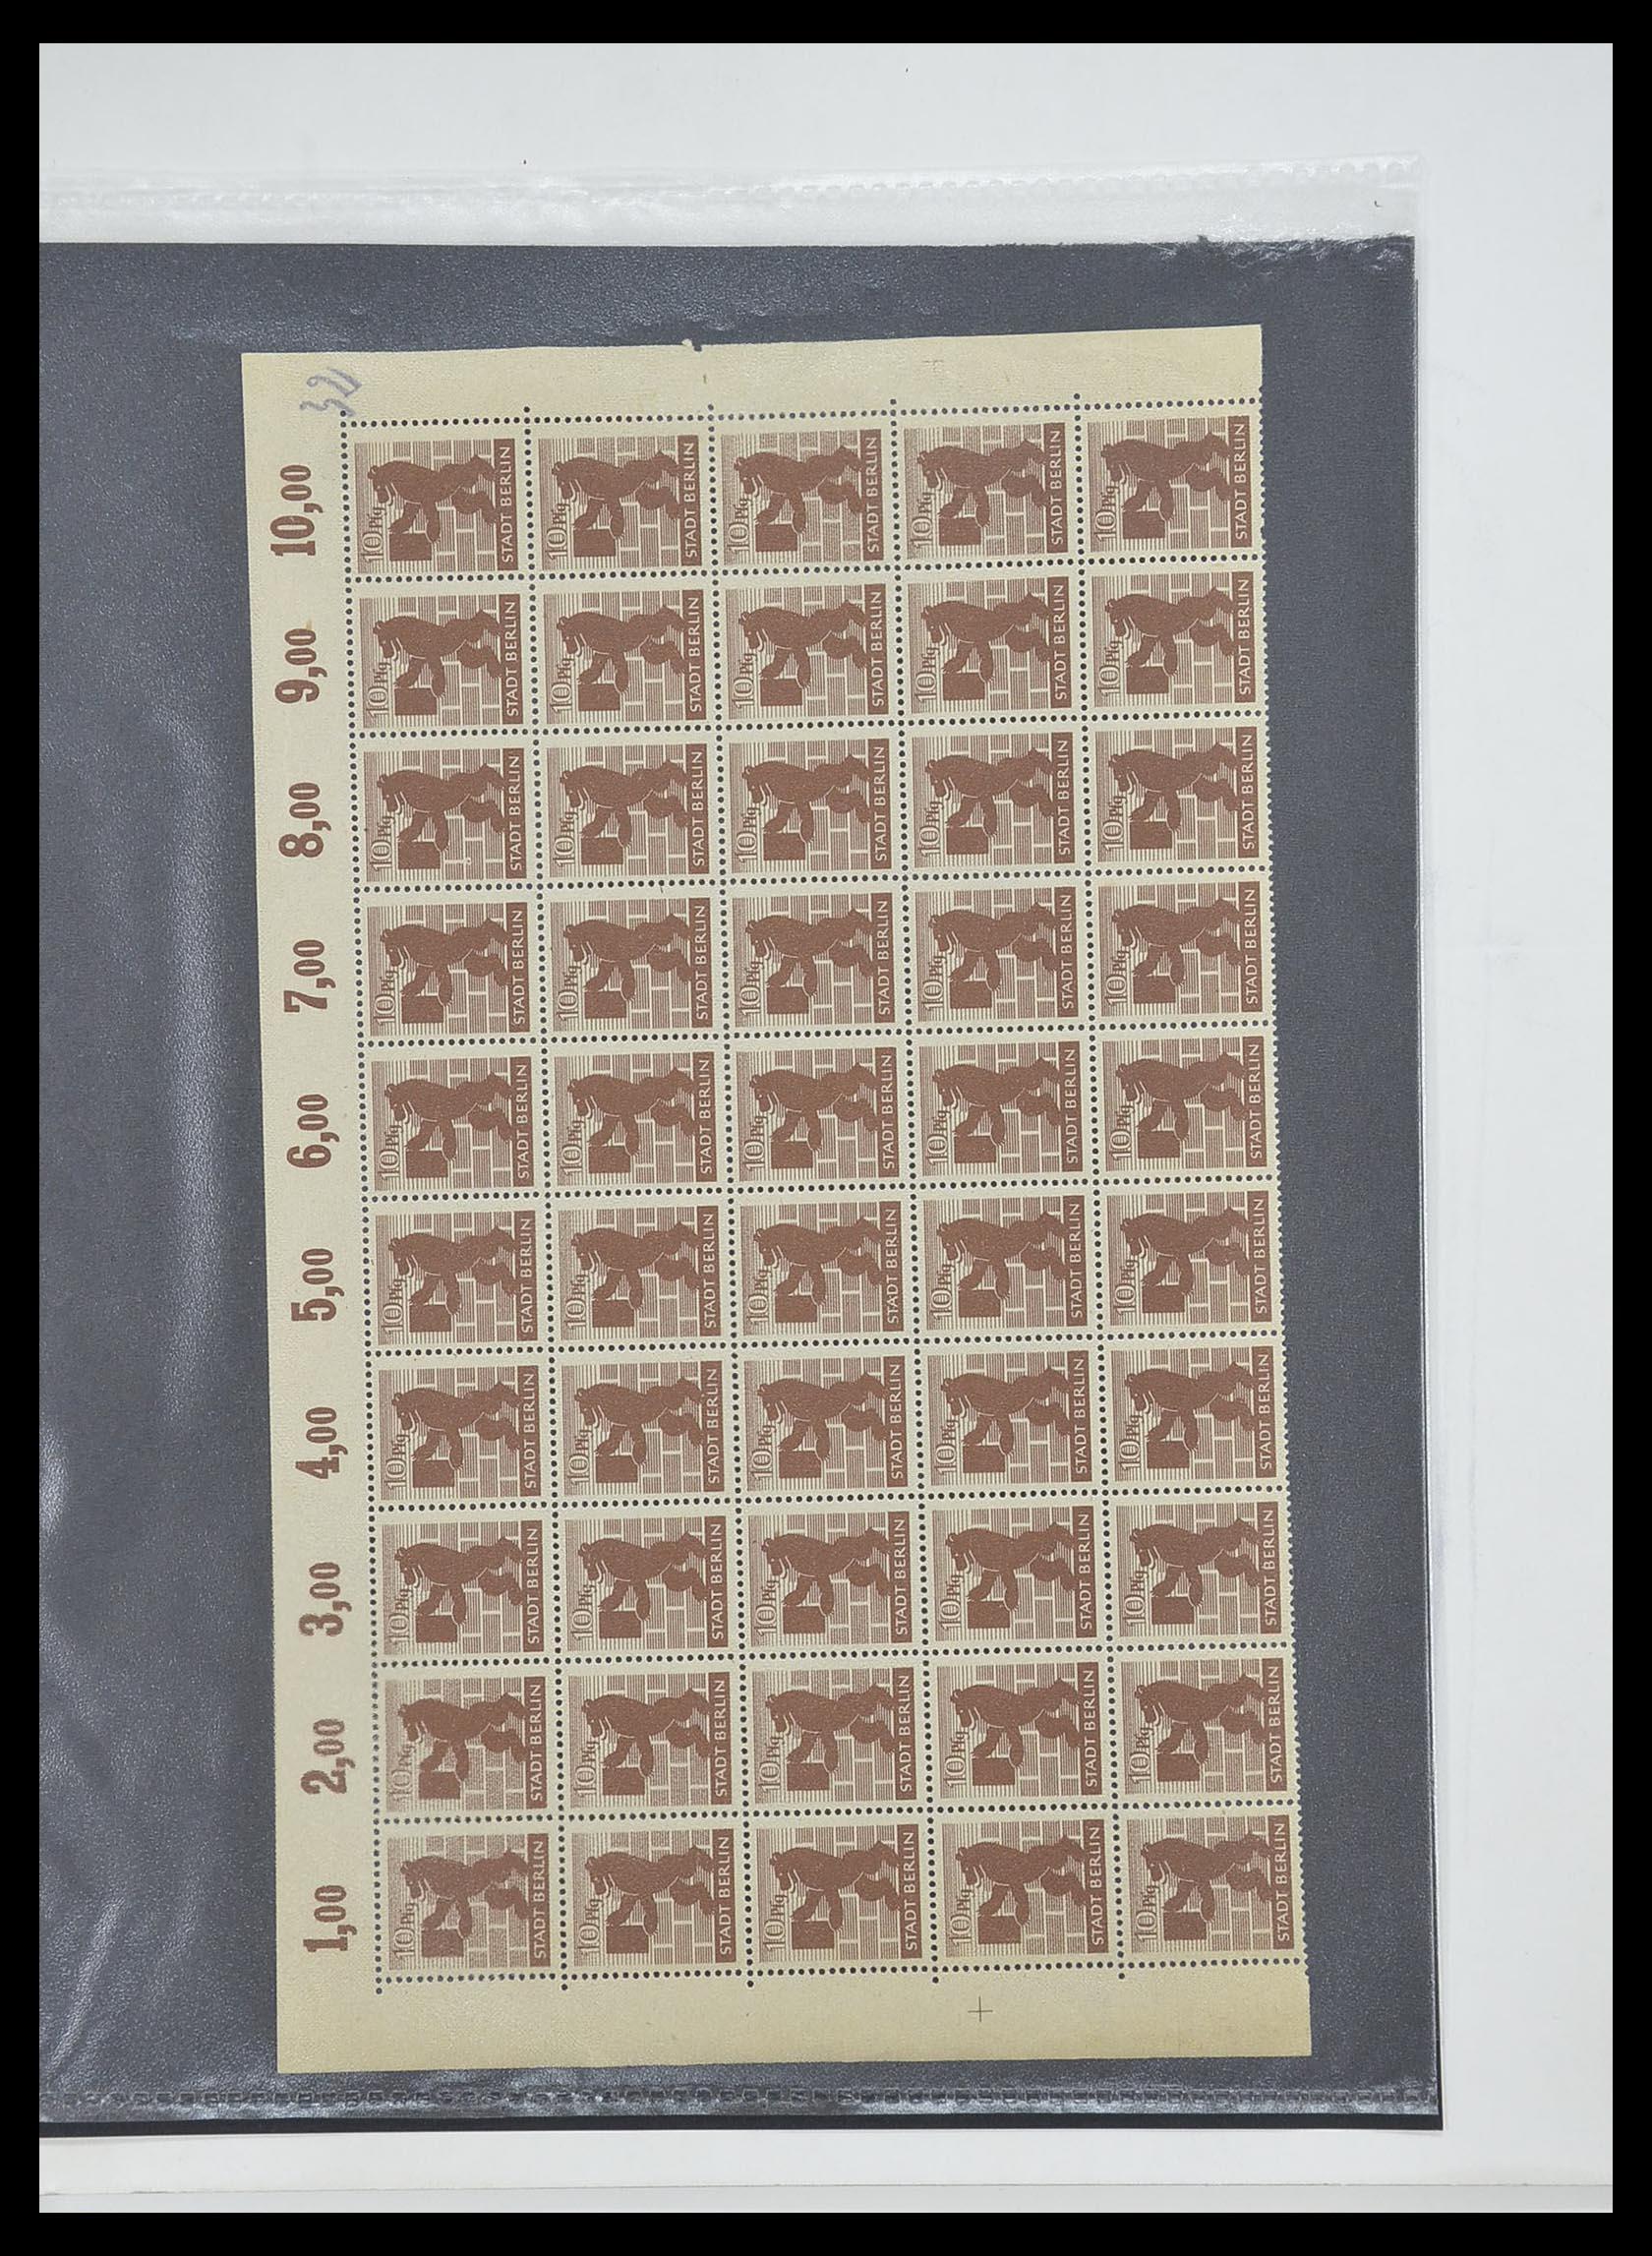 33698 007 - Postzegelverzameling 33698 Sovjet Zone 1945-1948.